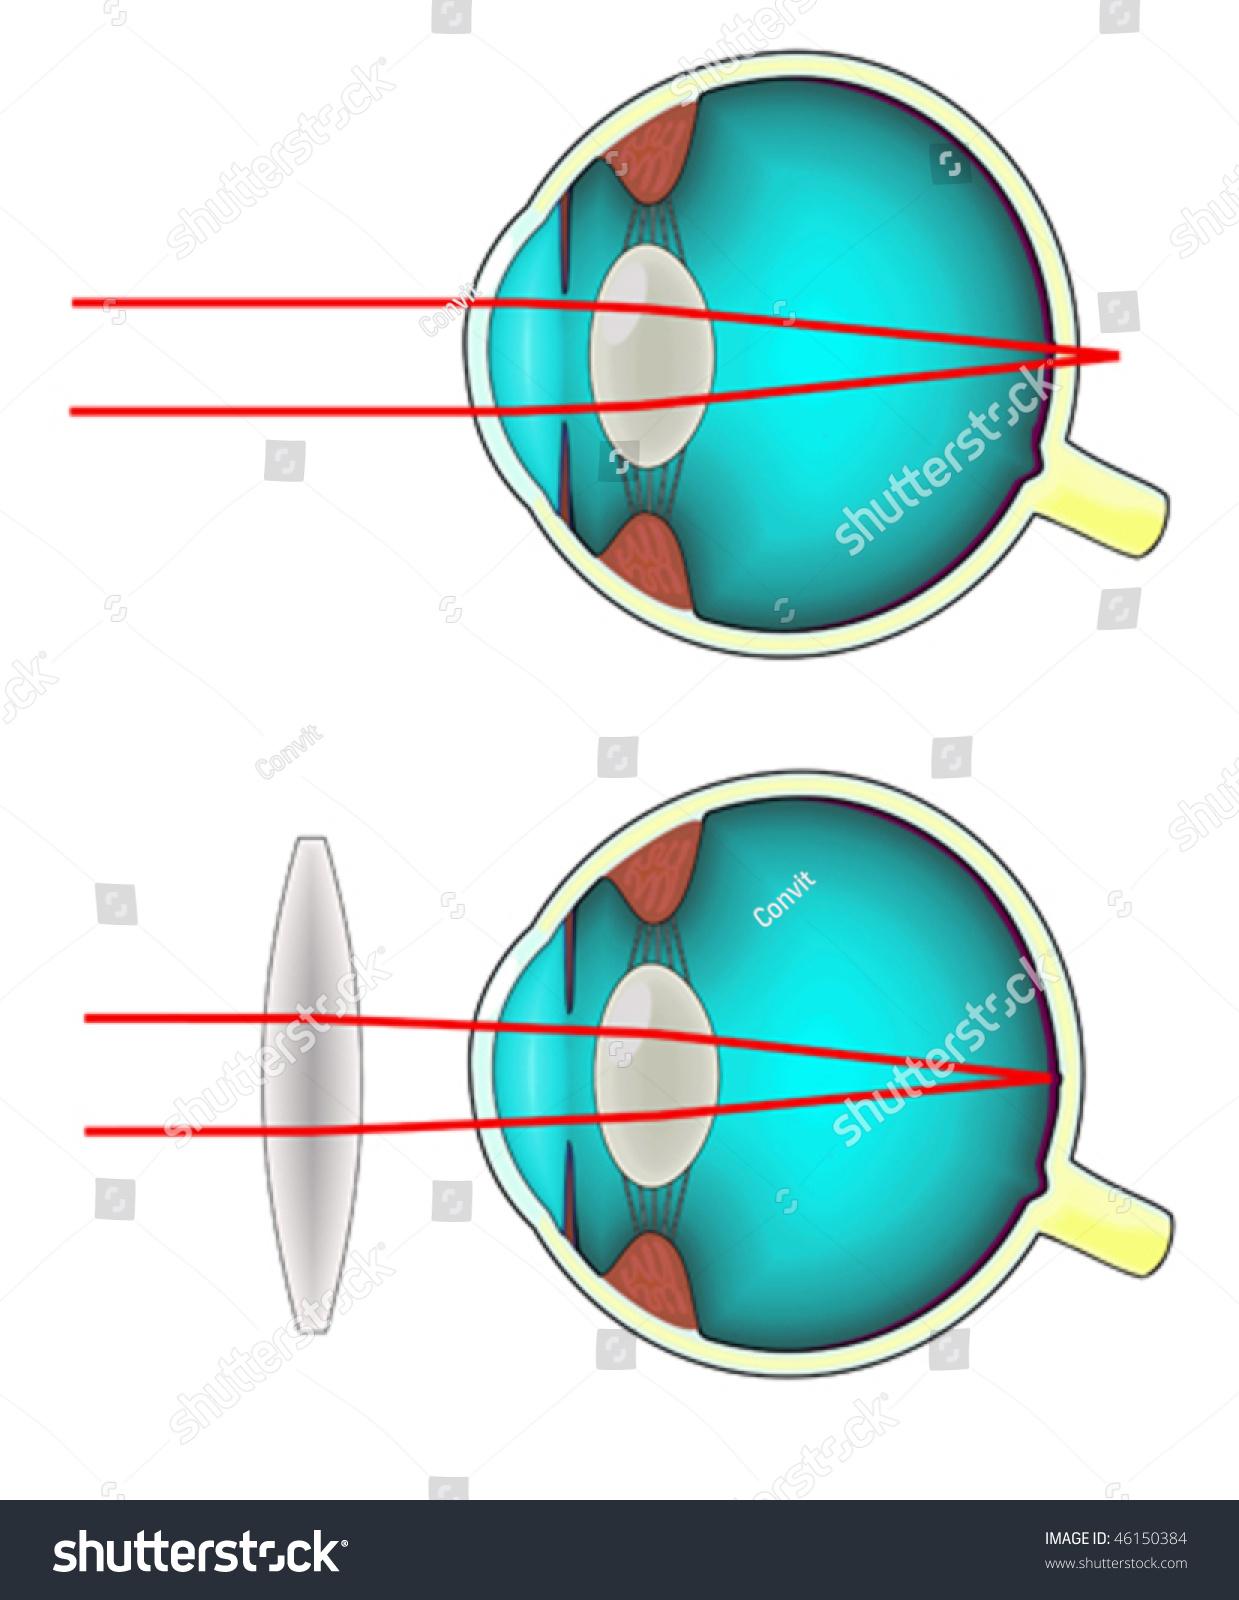 Longsighted eye diagram stock vector 46150384 shutterstock long sighted eye diagram pooptronica Gallery